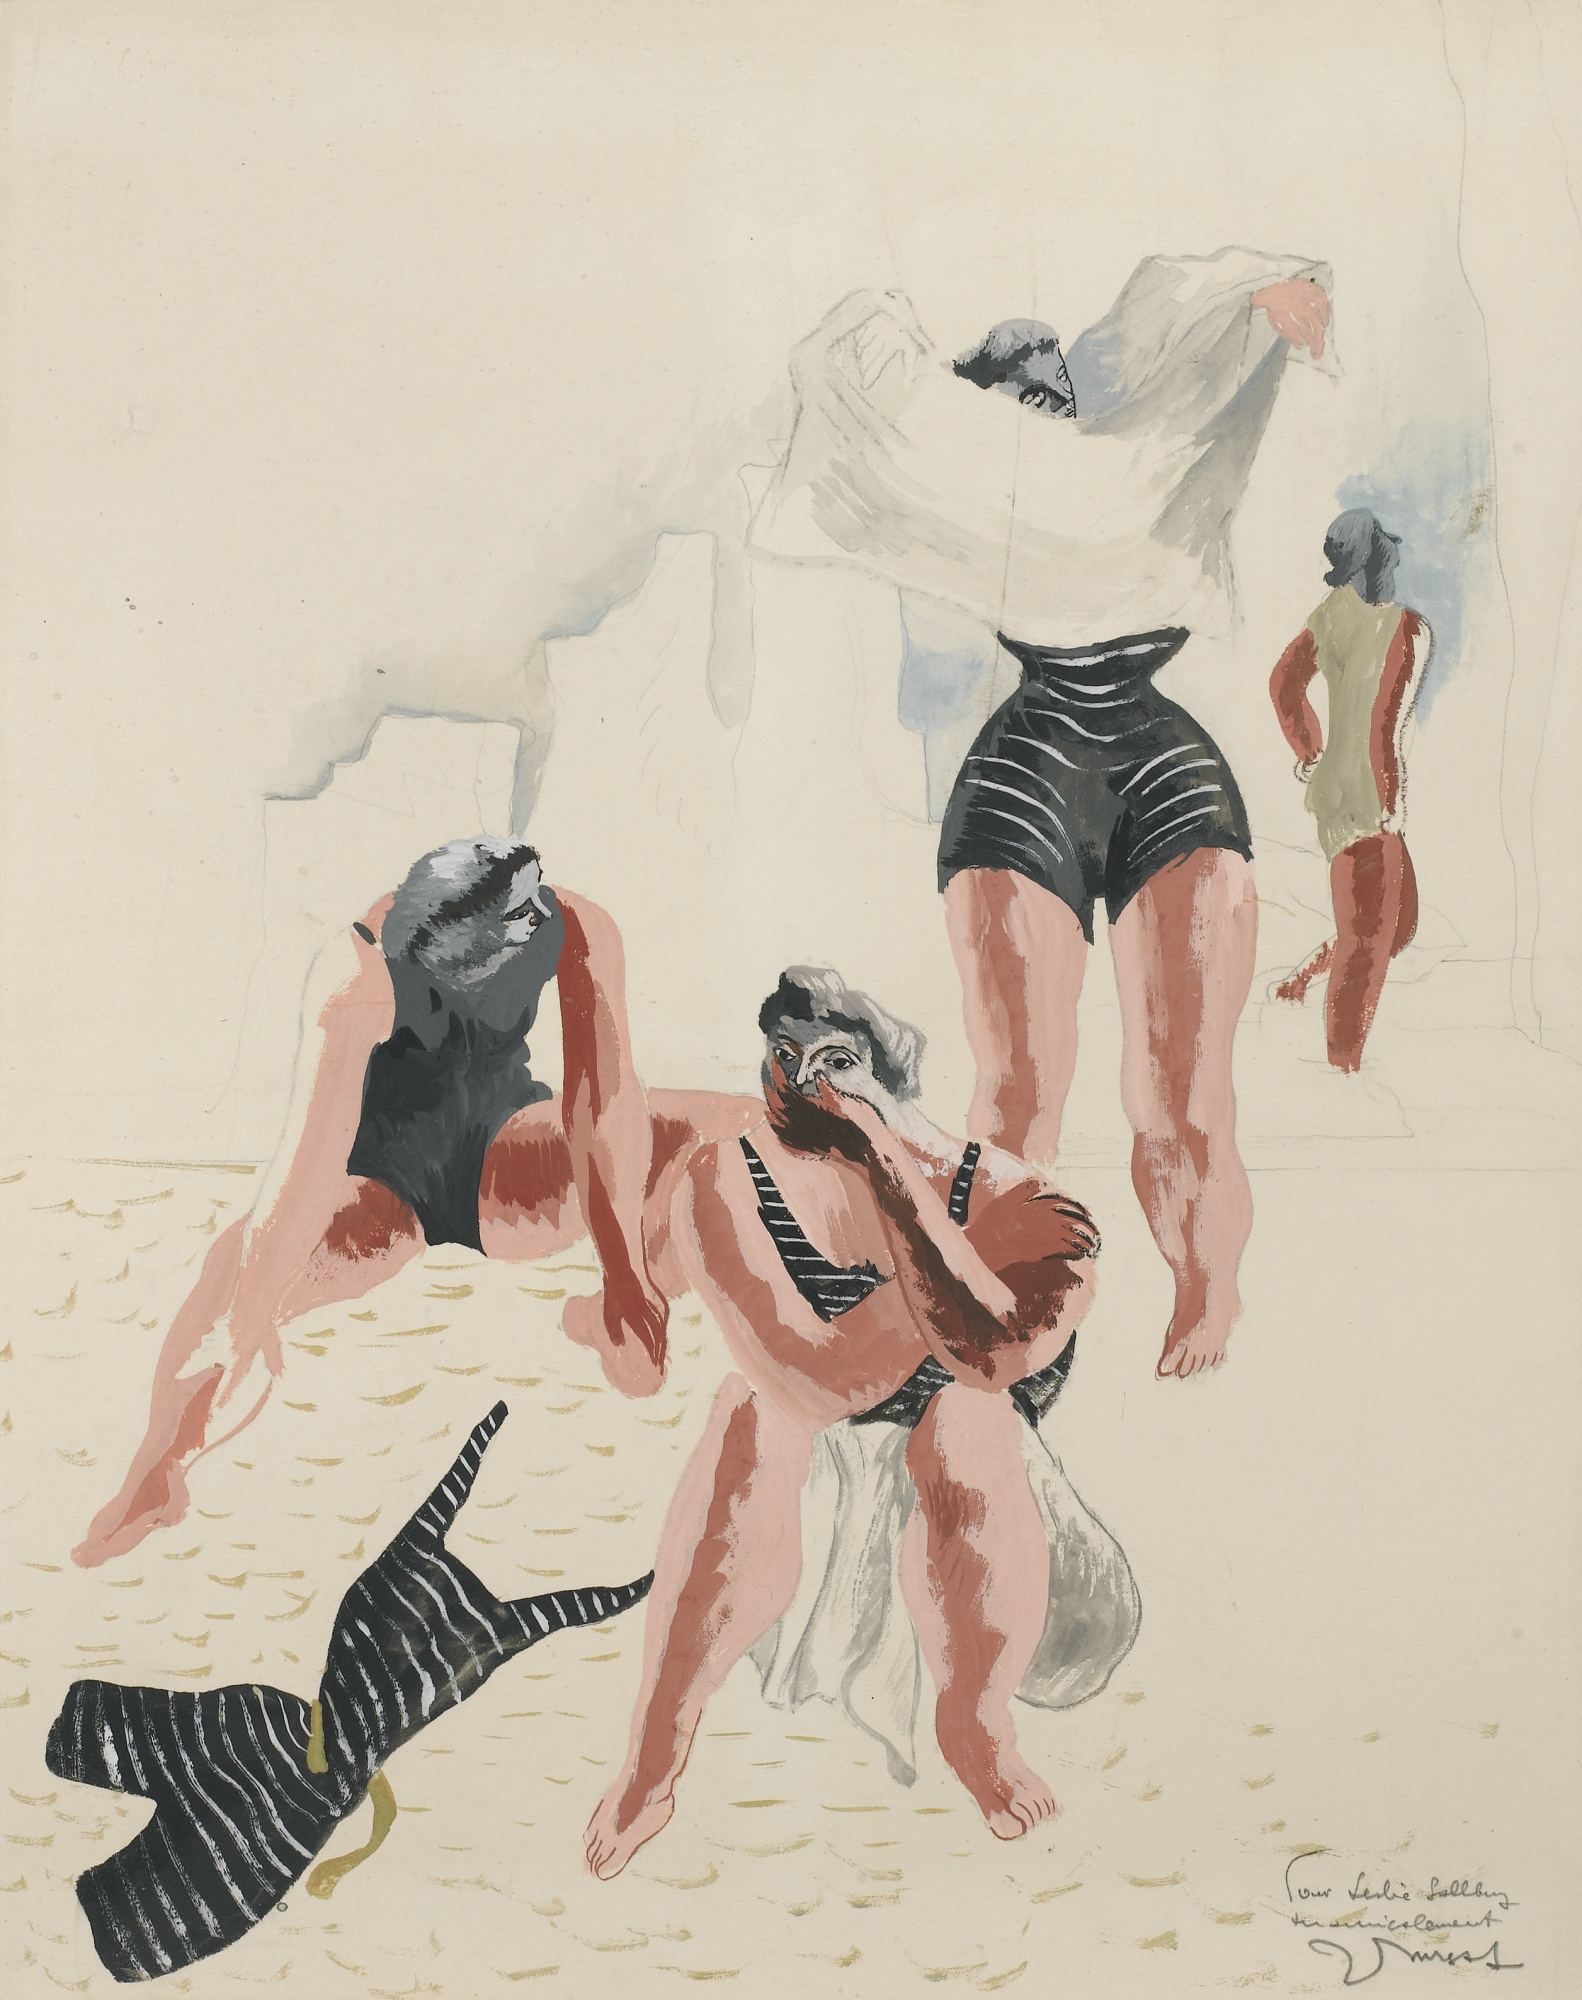 Jean Lurcat-Baigneuses-1933